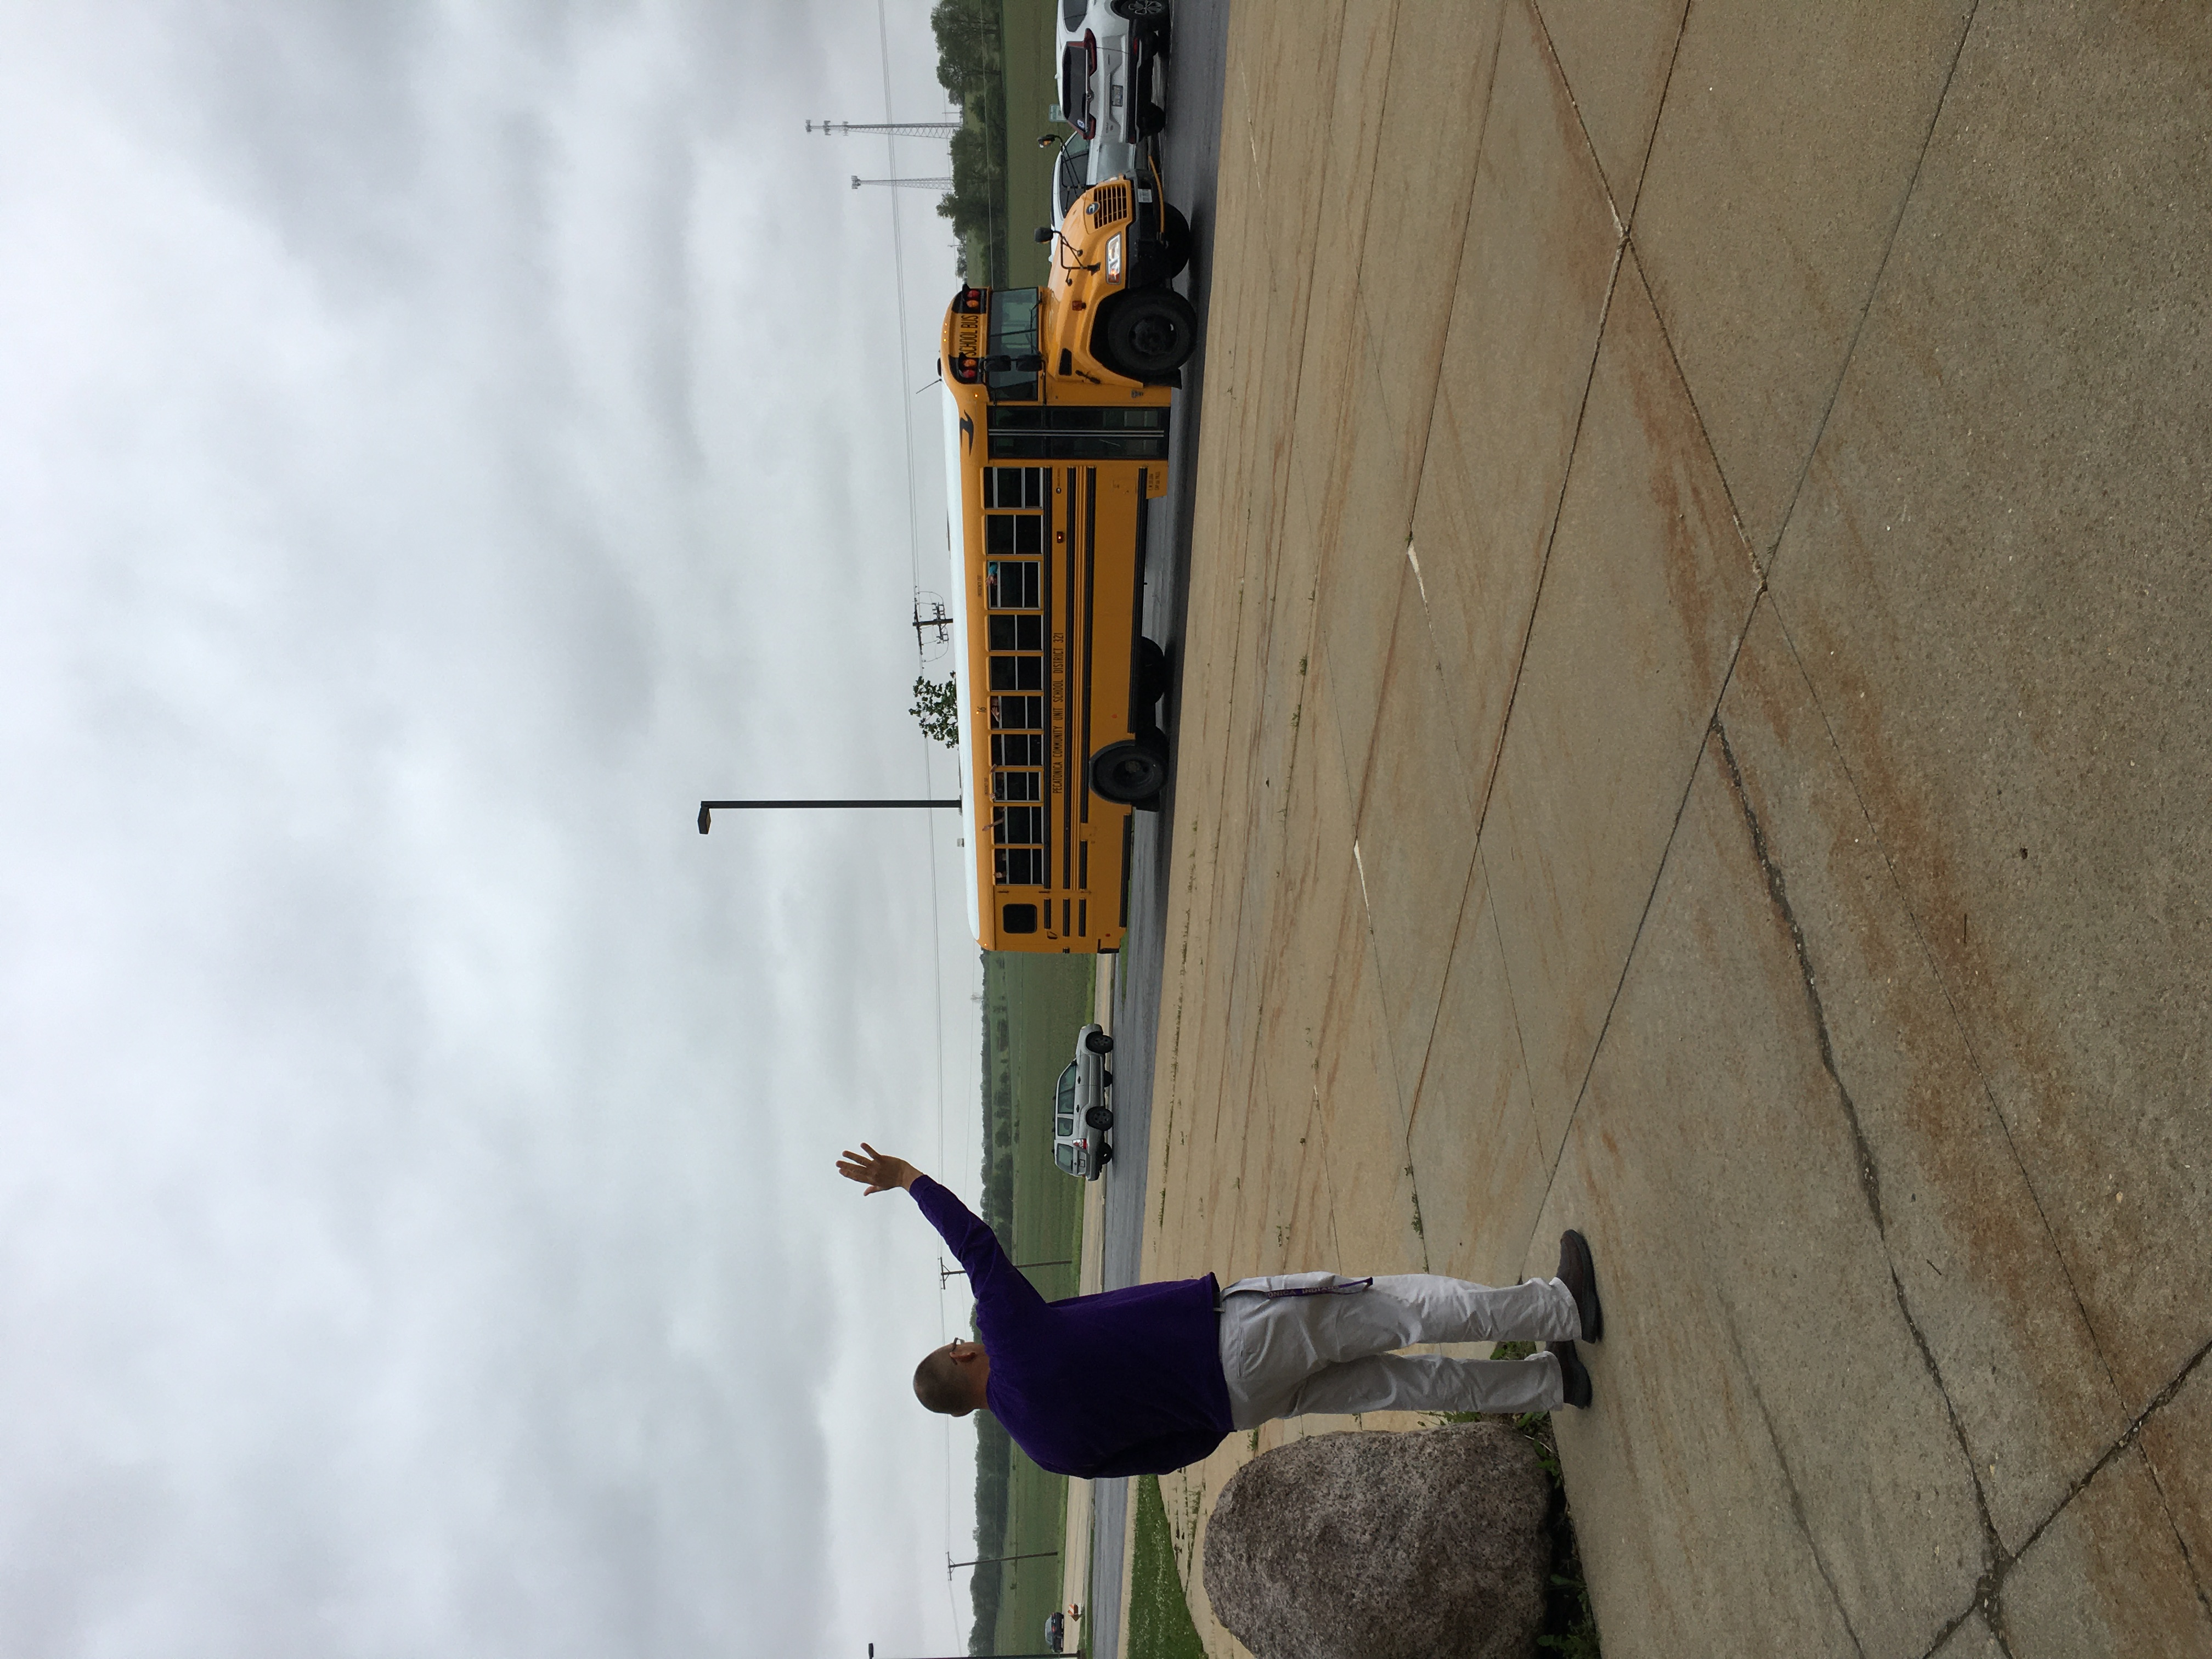 Goodbye Mr. Faller...from the bus kids